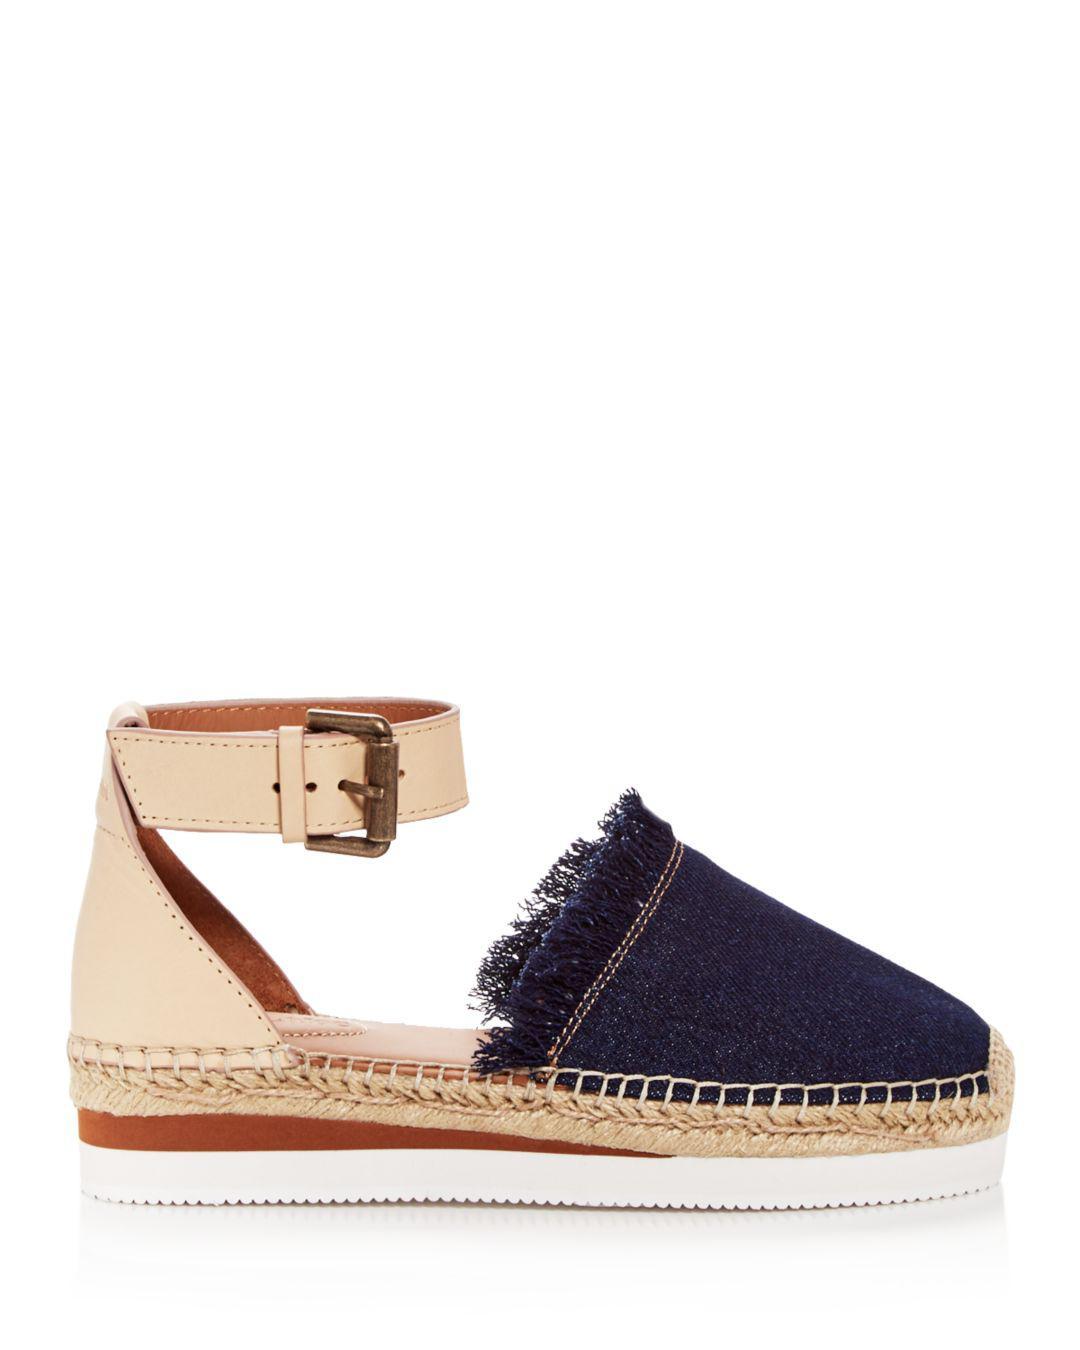 234ddb942 See By Chloé Women's Leather & Denim Fringe Platform Sandals in Blue - Save  60.90909090909091% - Lyst